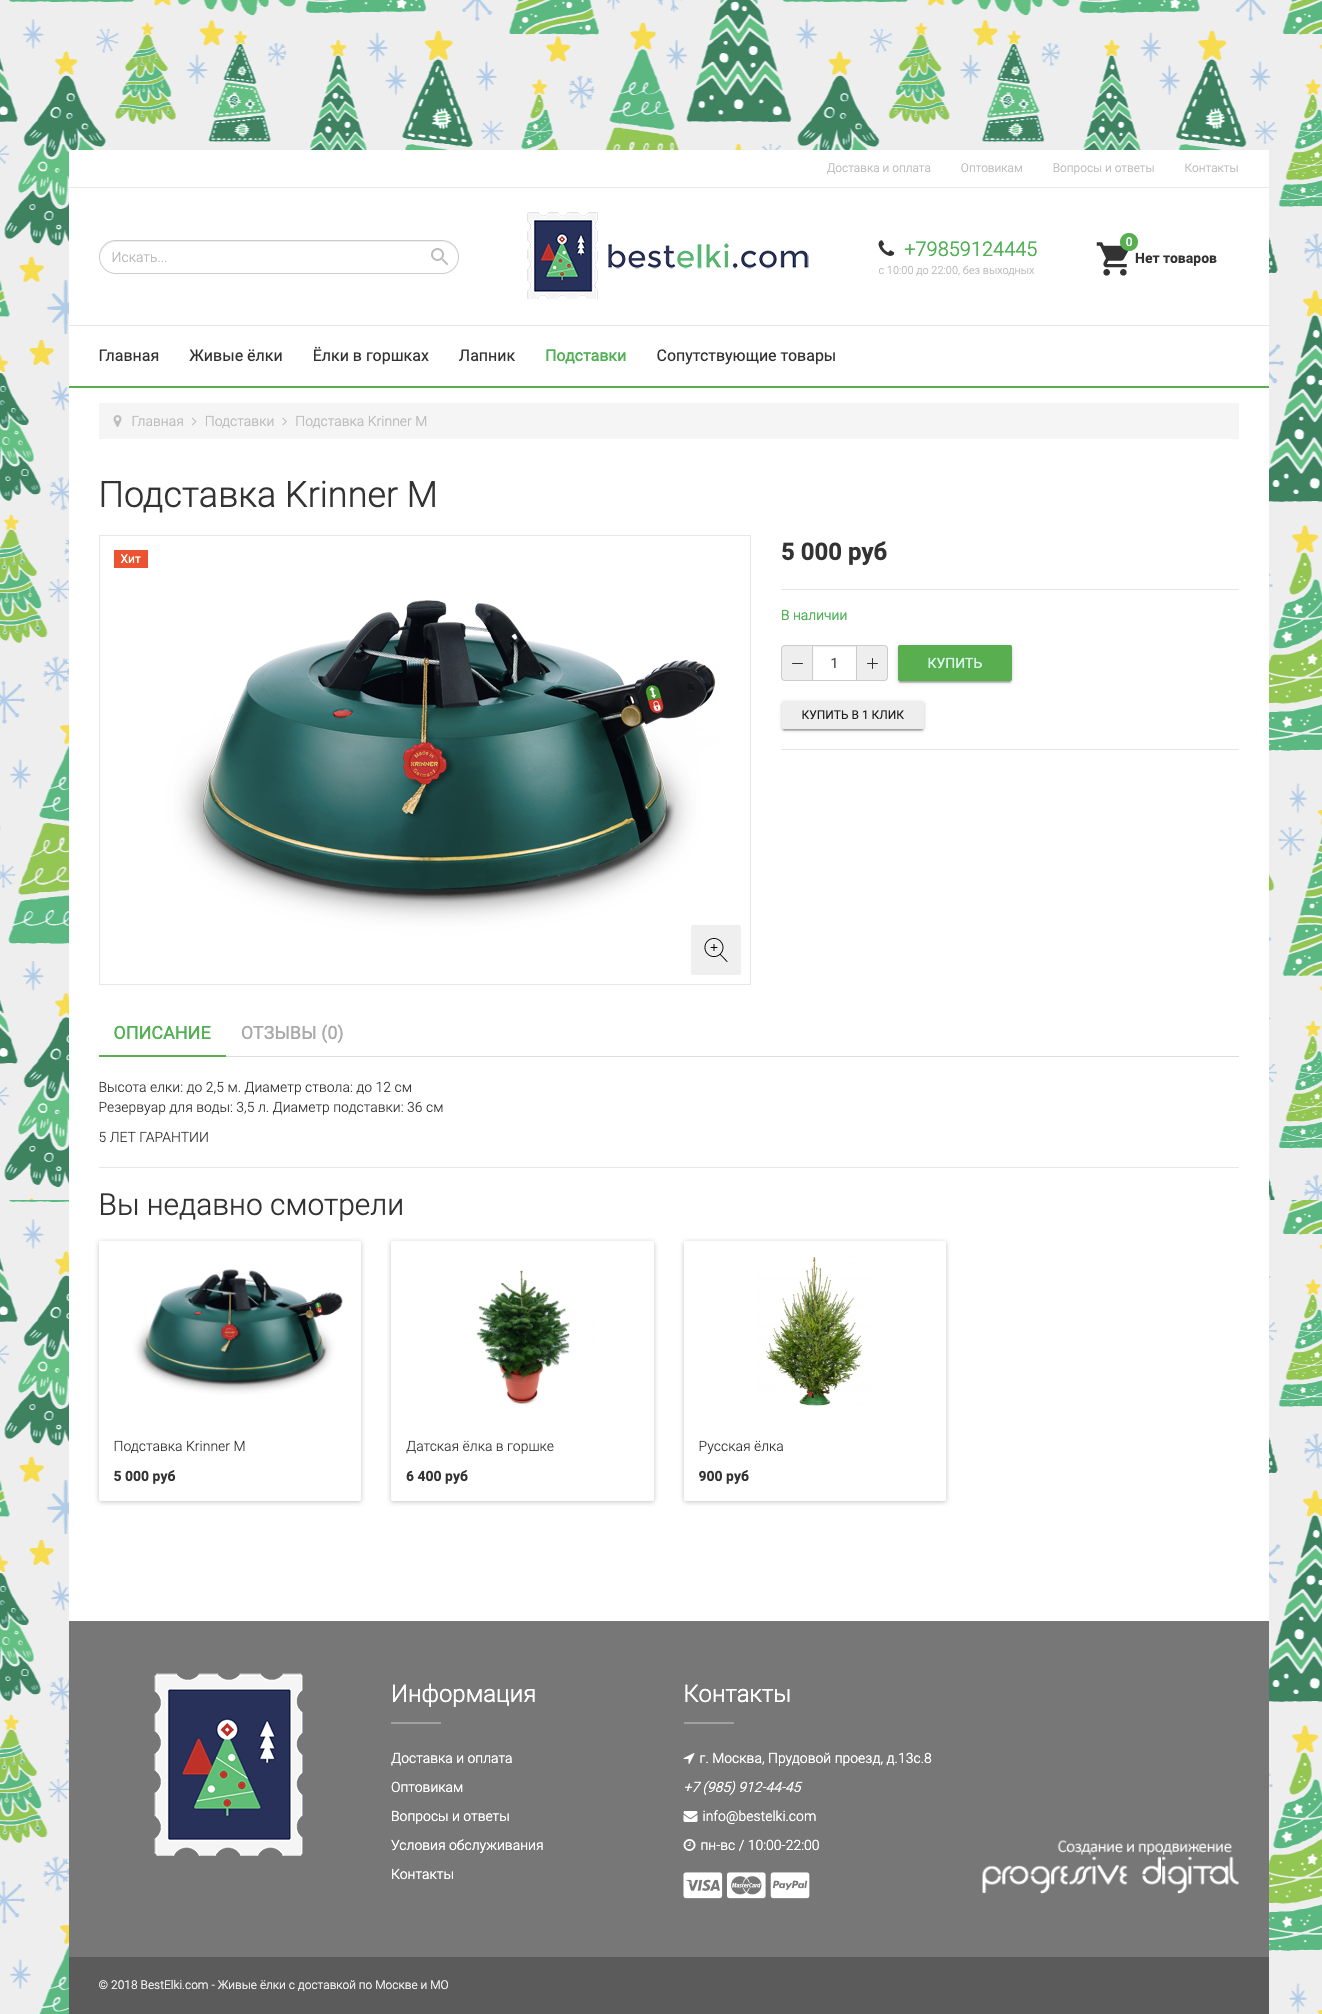 Bestelki.com (интернет-магазин, v.2.0, Joomla + VirtueMart)